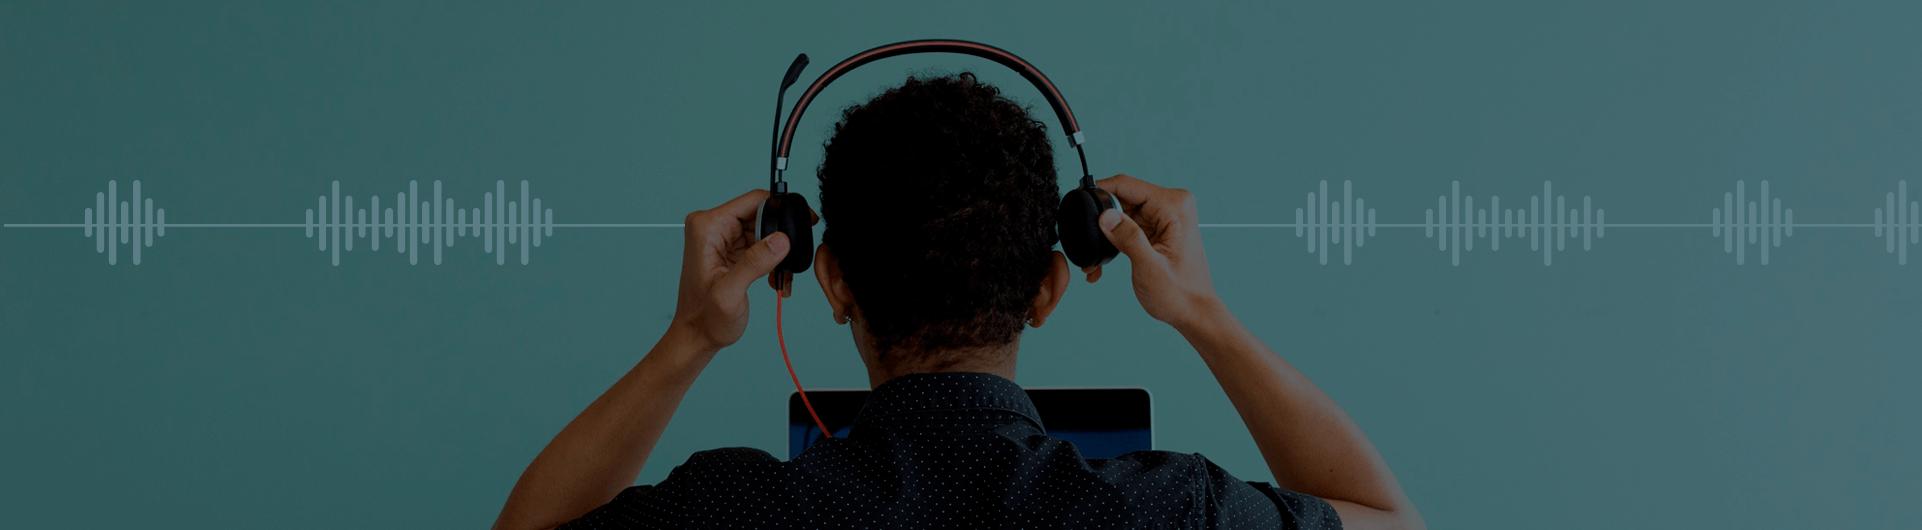 Salesforce service voice